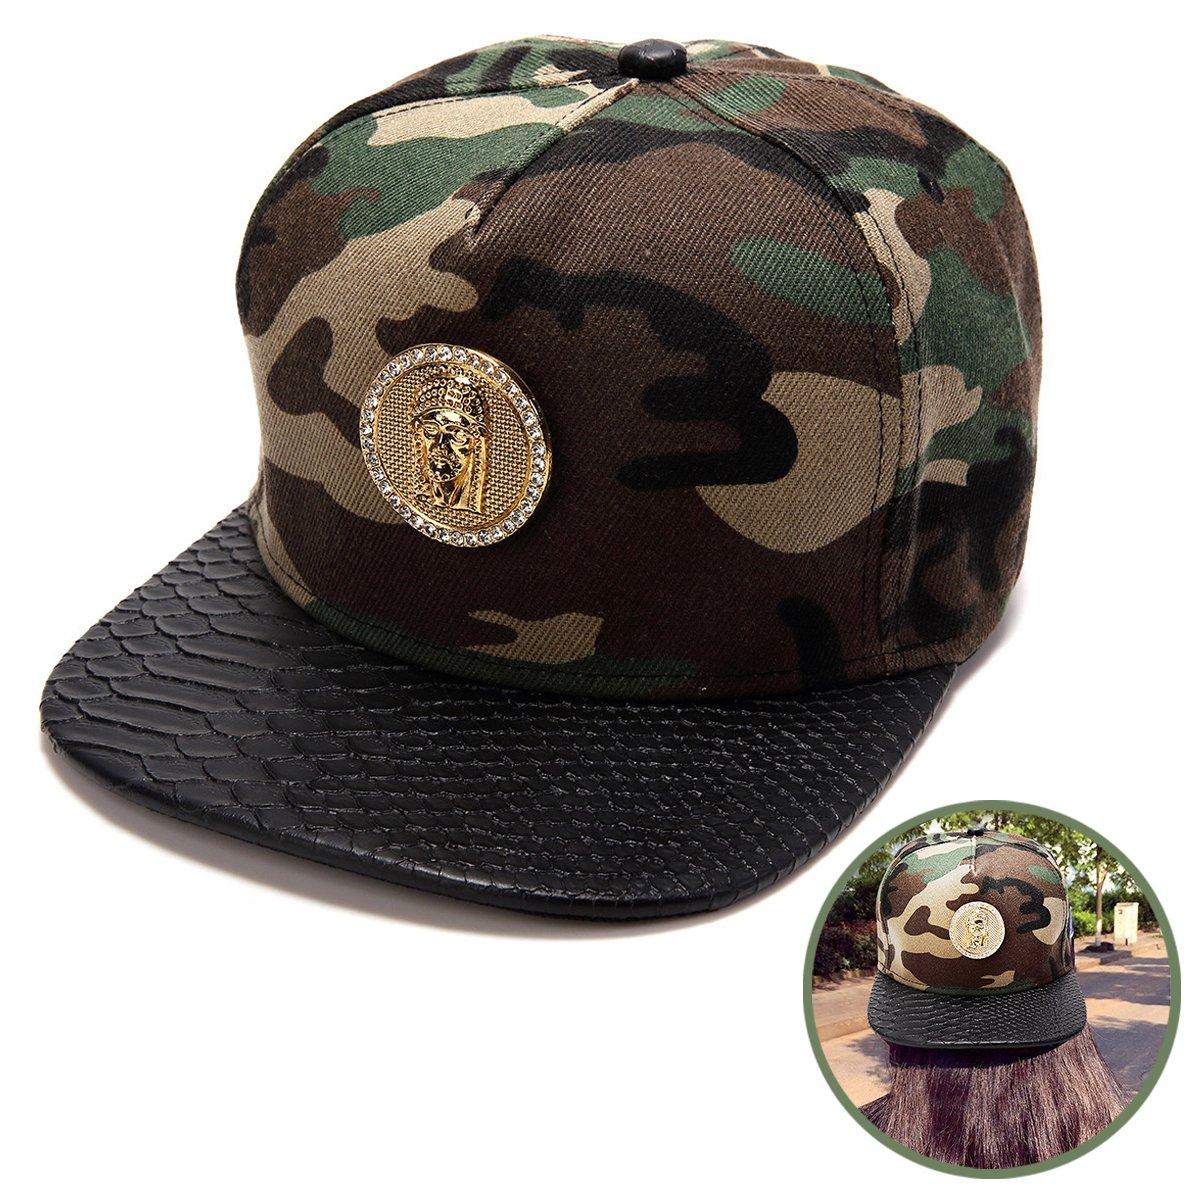 Amazon.com  Haters Clothing Accessories Adjustable Jesus Christ Cotton Camo Snapback  Cap Hater Hat for Men   Women Baseball Cap  Sports   Outdoors 59007817bb0